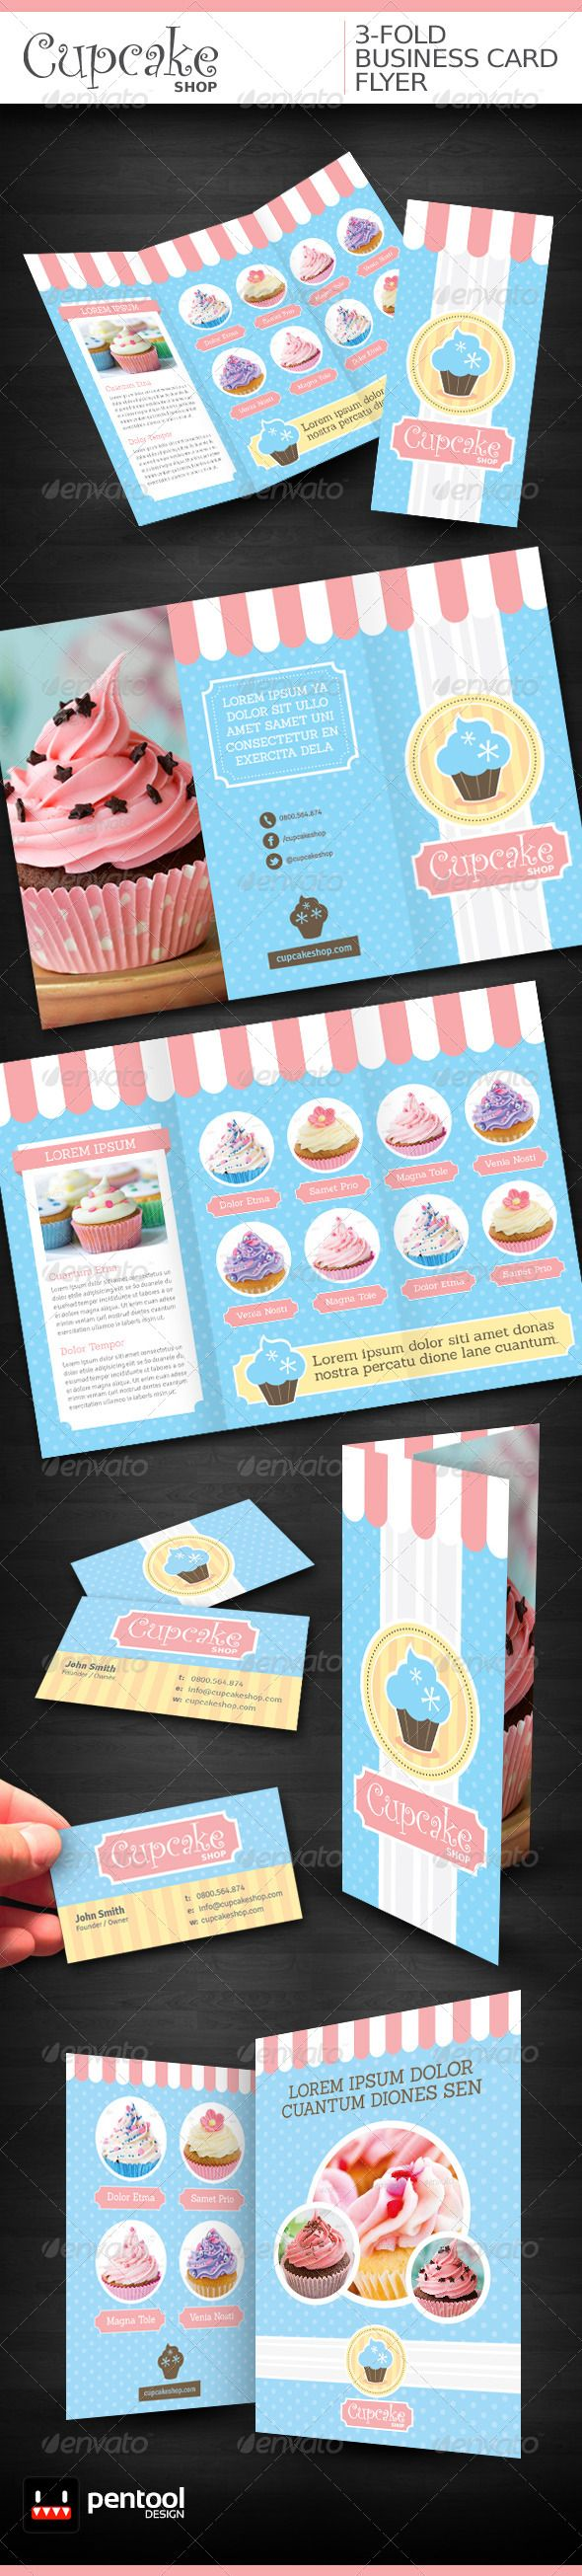 Cupcake shop 3 foldbusiness cardflyer folded business cards cupcake shop 3 foldbusiness cardflyer magicingreecefo Images